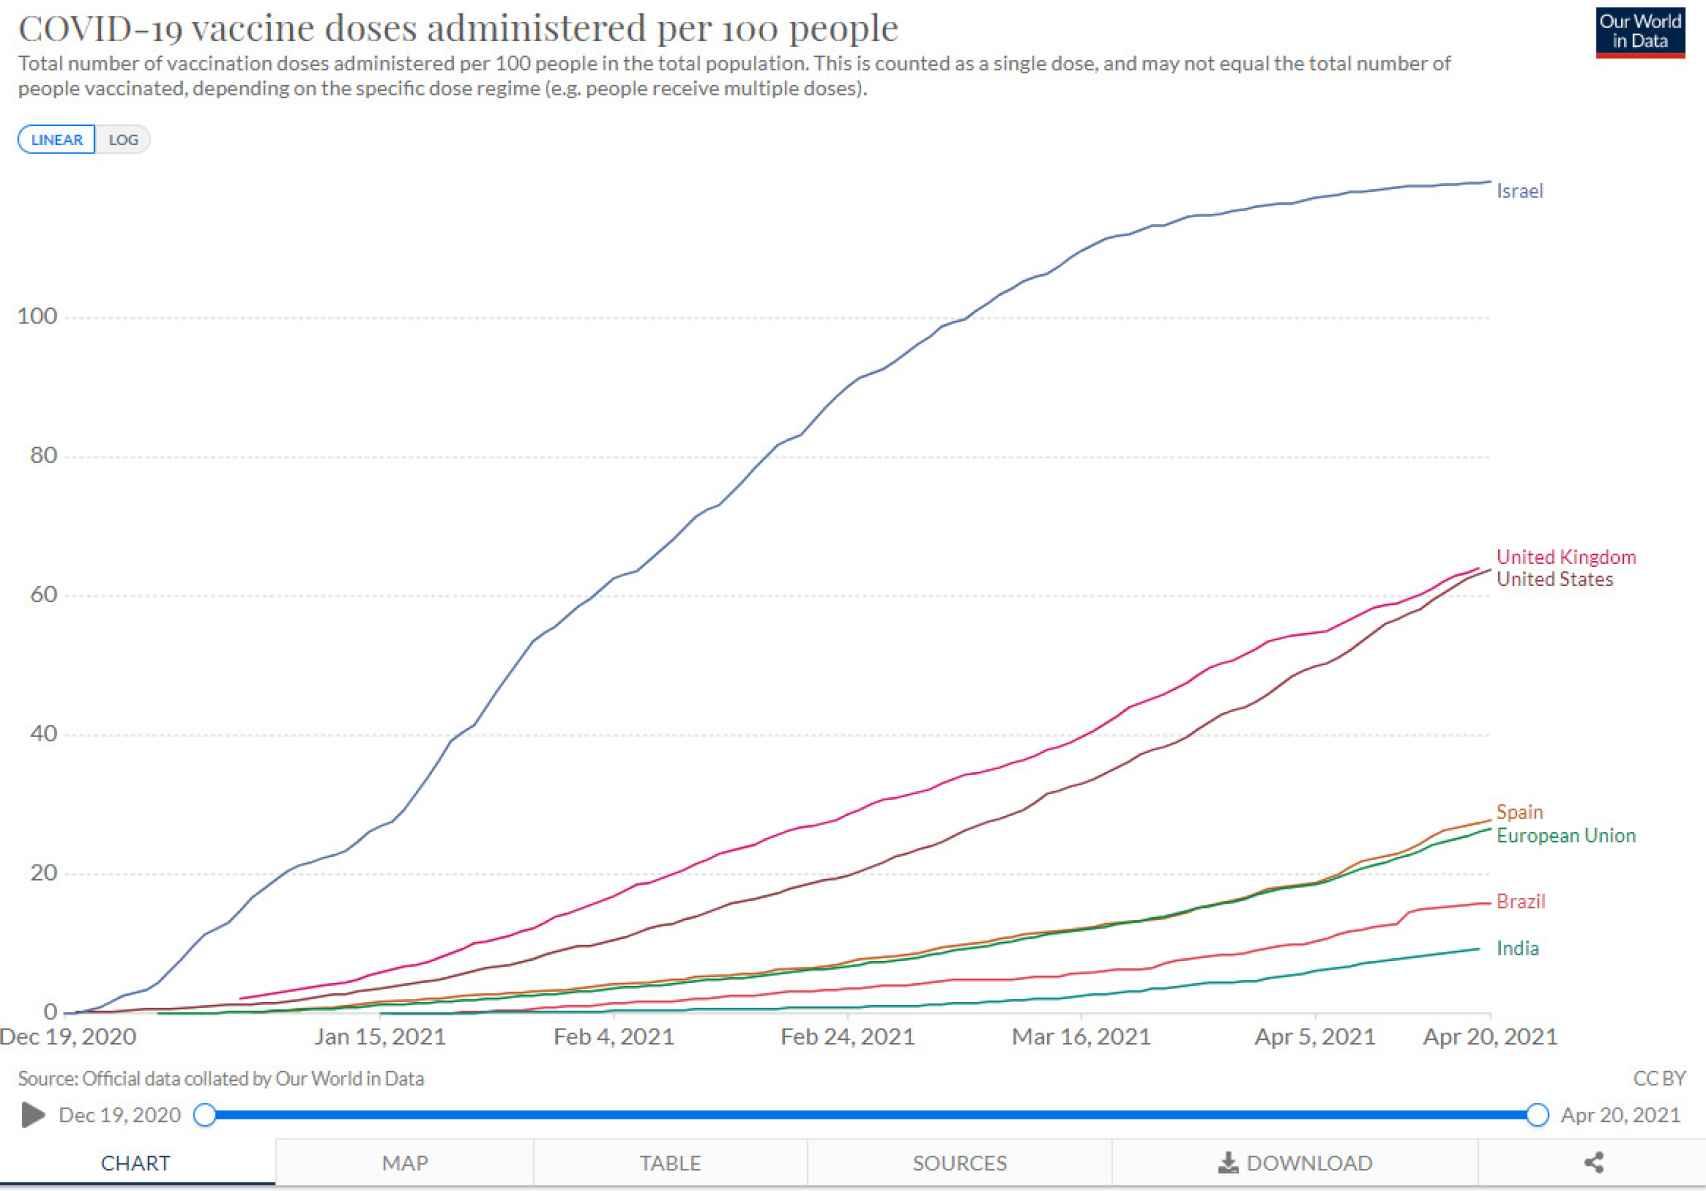 Dosis de vacuna administradas por cada 100 personas.